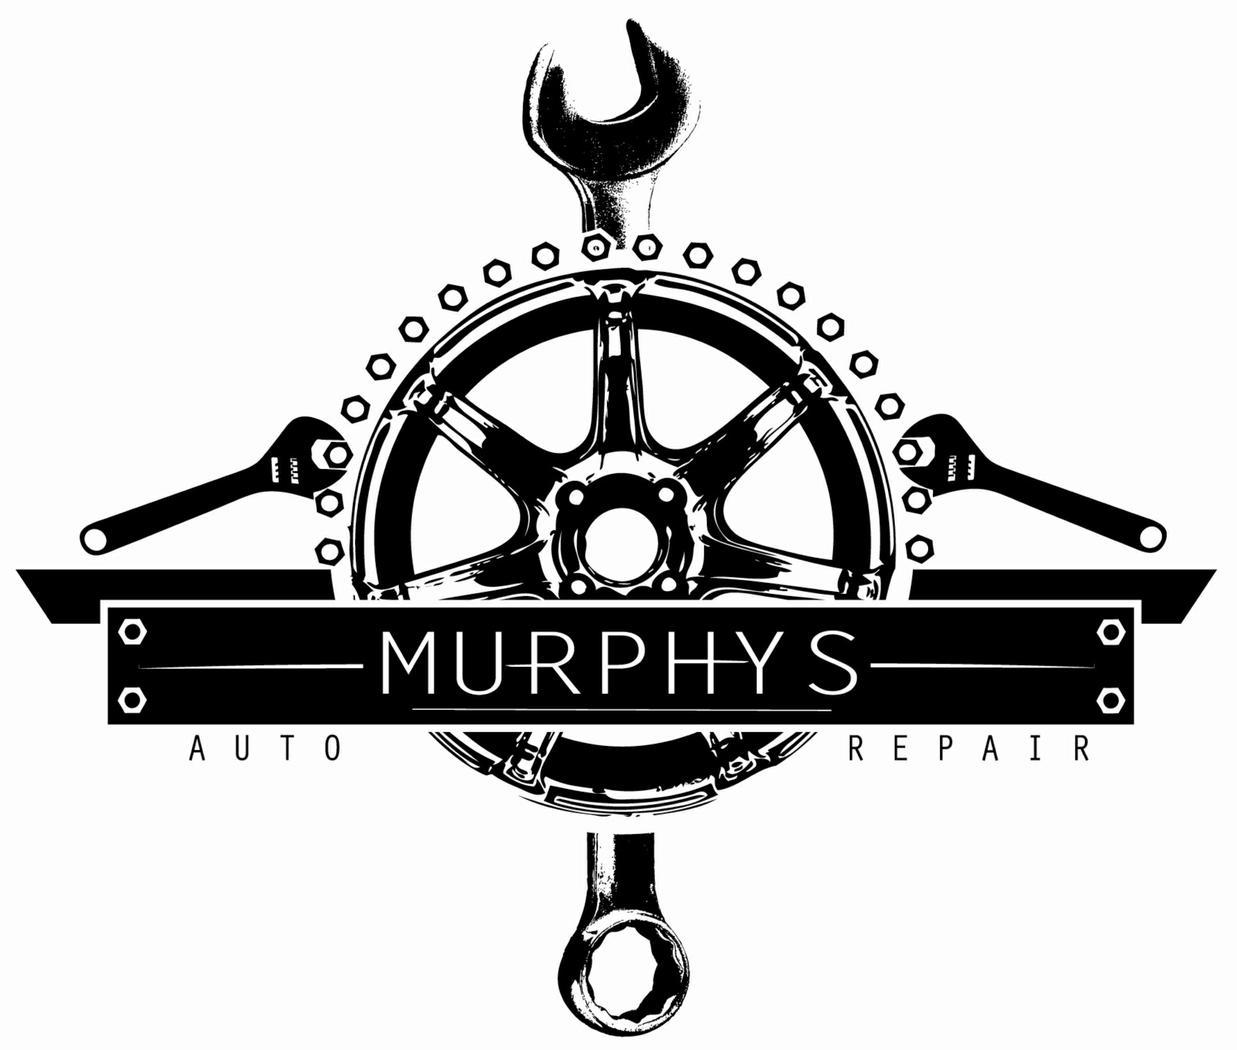 s murphy